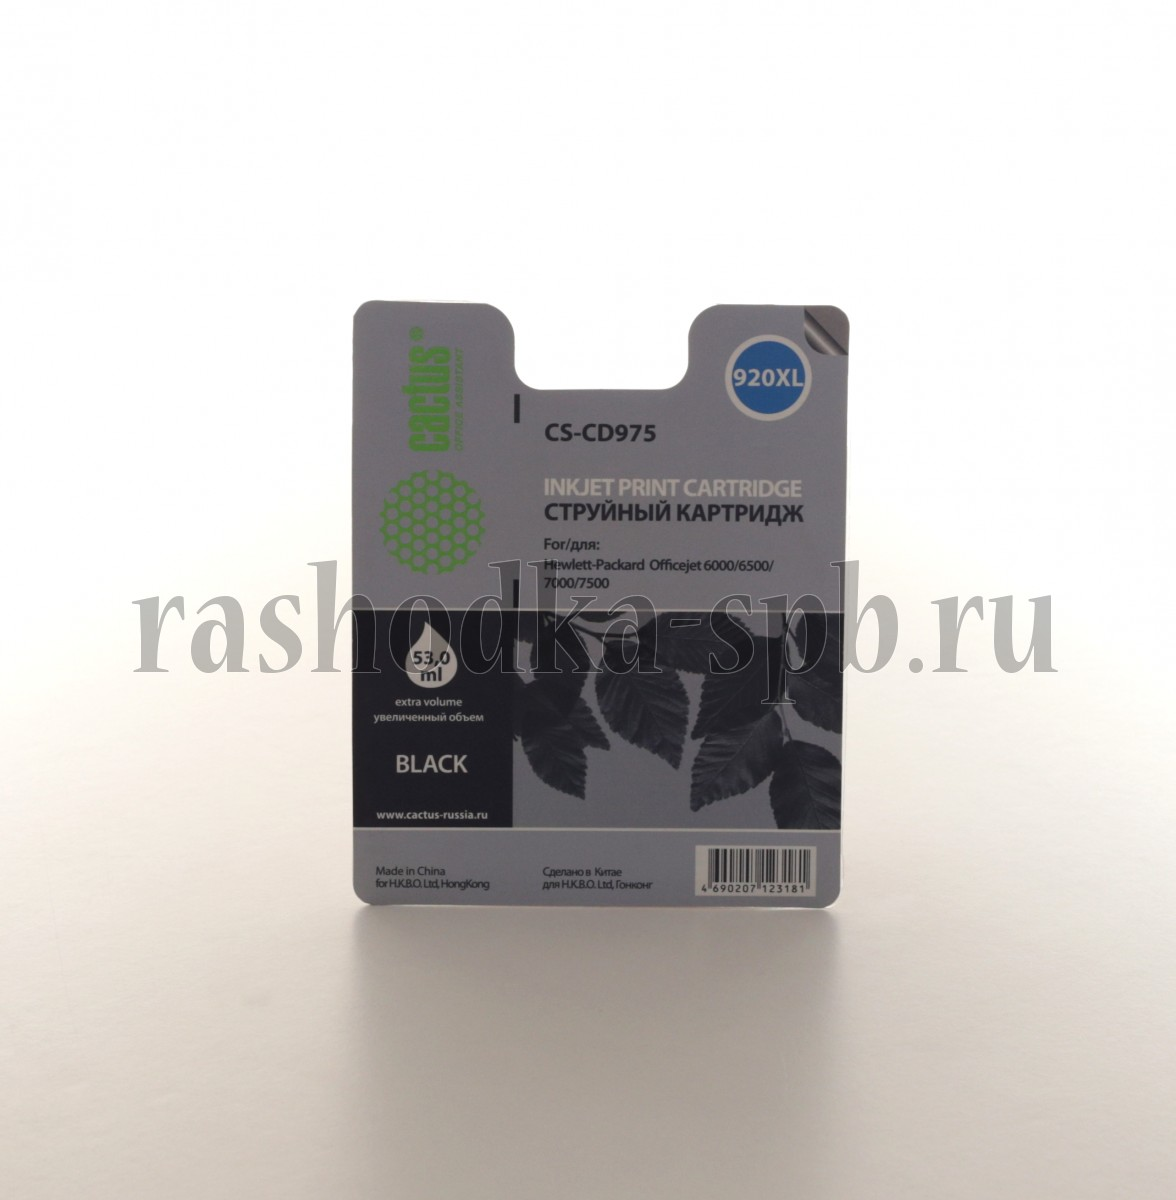 Чернила Cactus CS-I-EPT1284 для Epson Stylus S22/SX125/SX420/SX425 Office BX305 100мл желтый